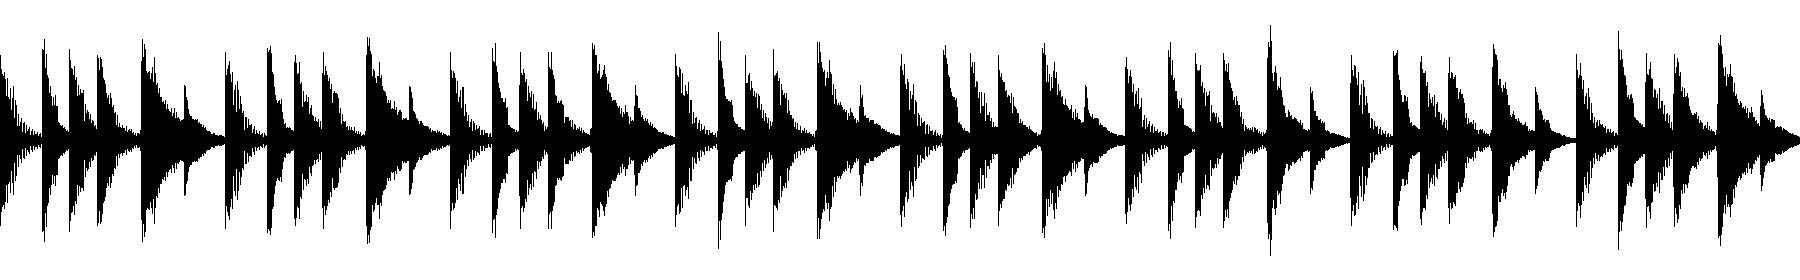 dts chordlp 19b cm